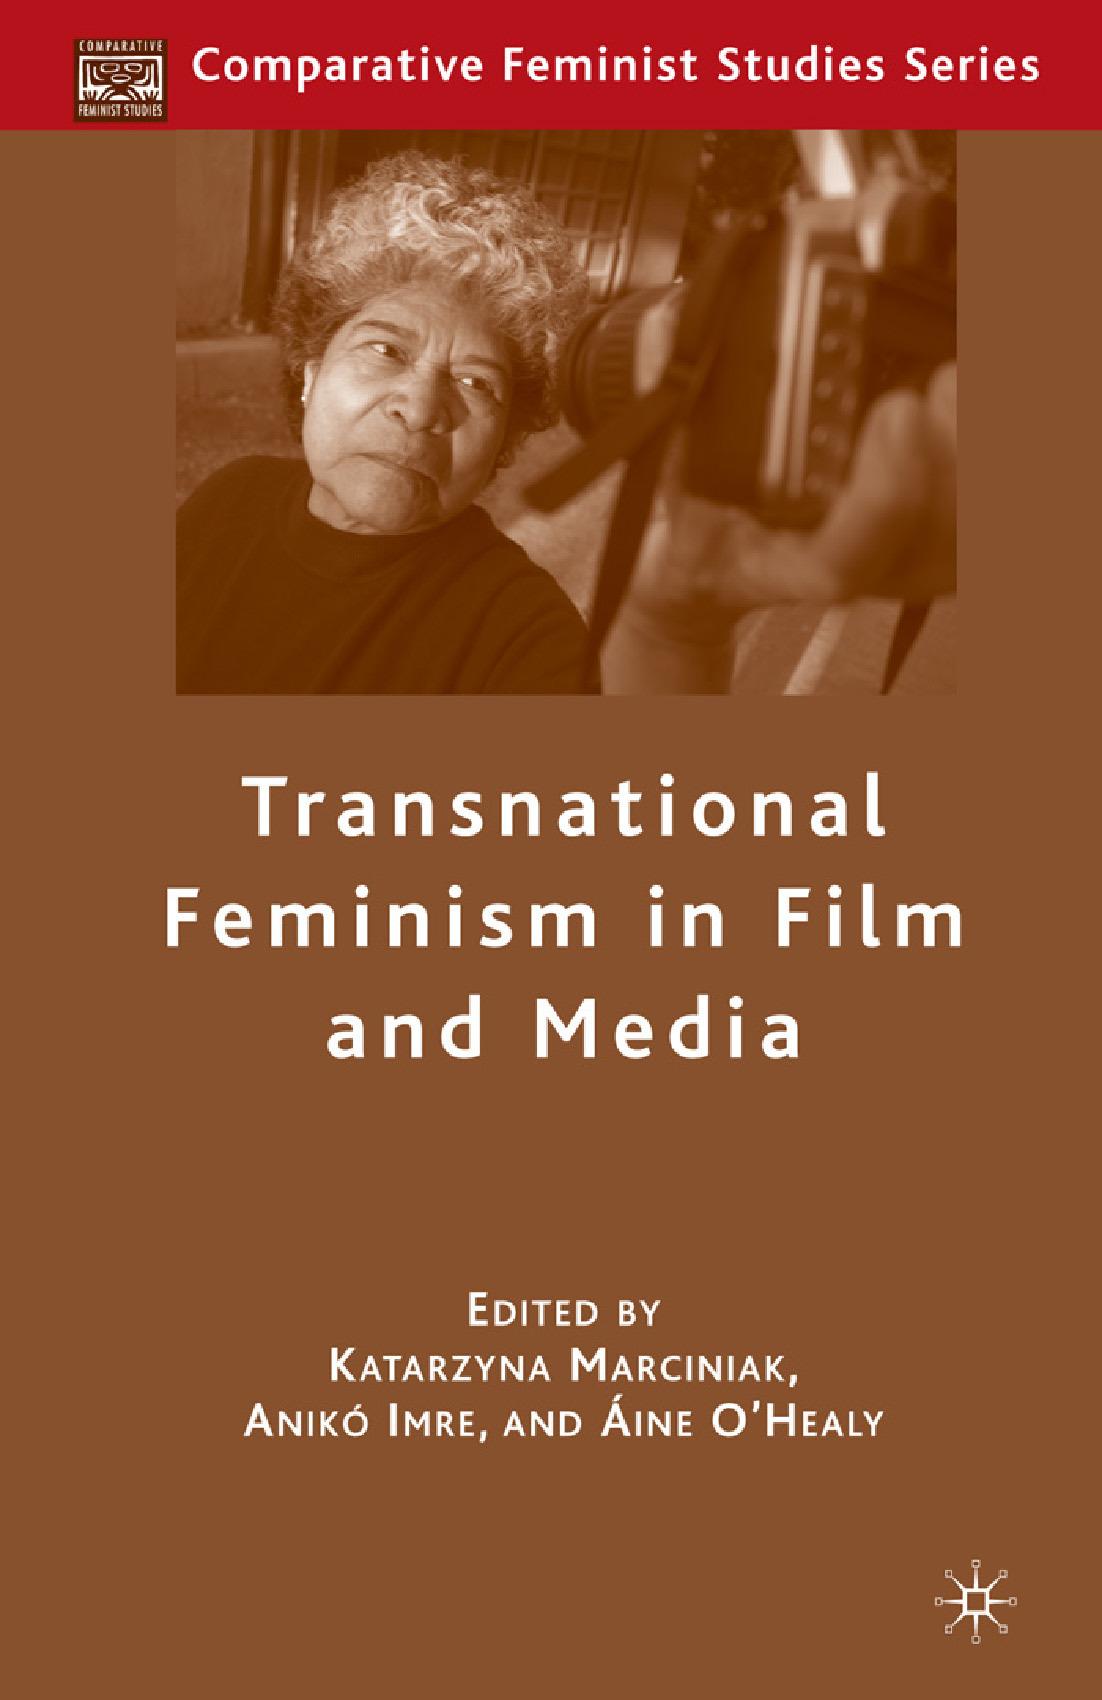 Imre, Anikó - Transnational Feminism in Film and Media, ebook